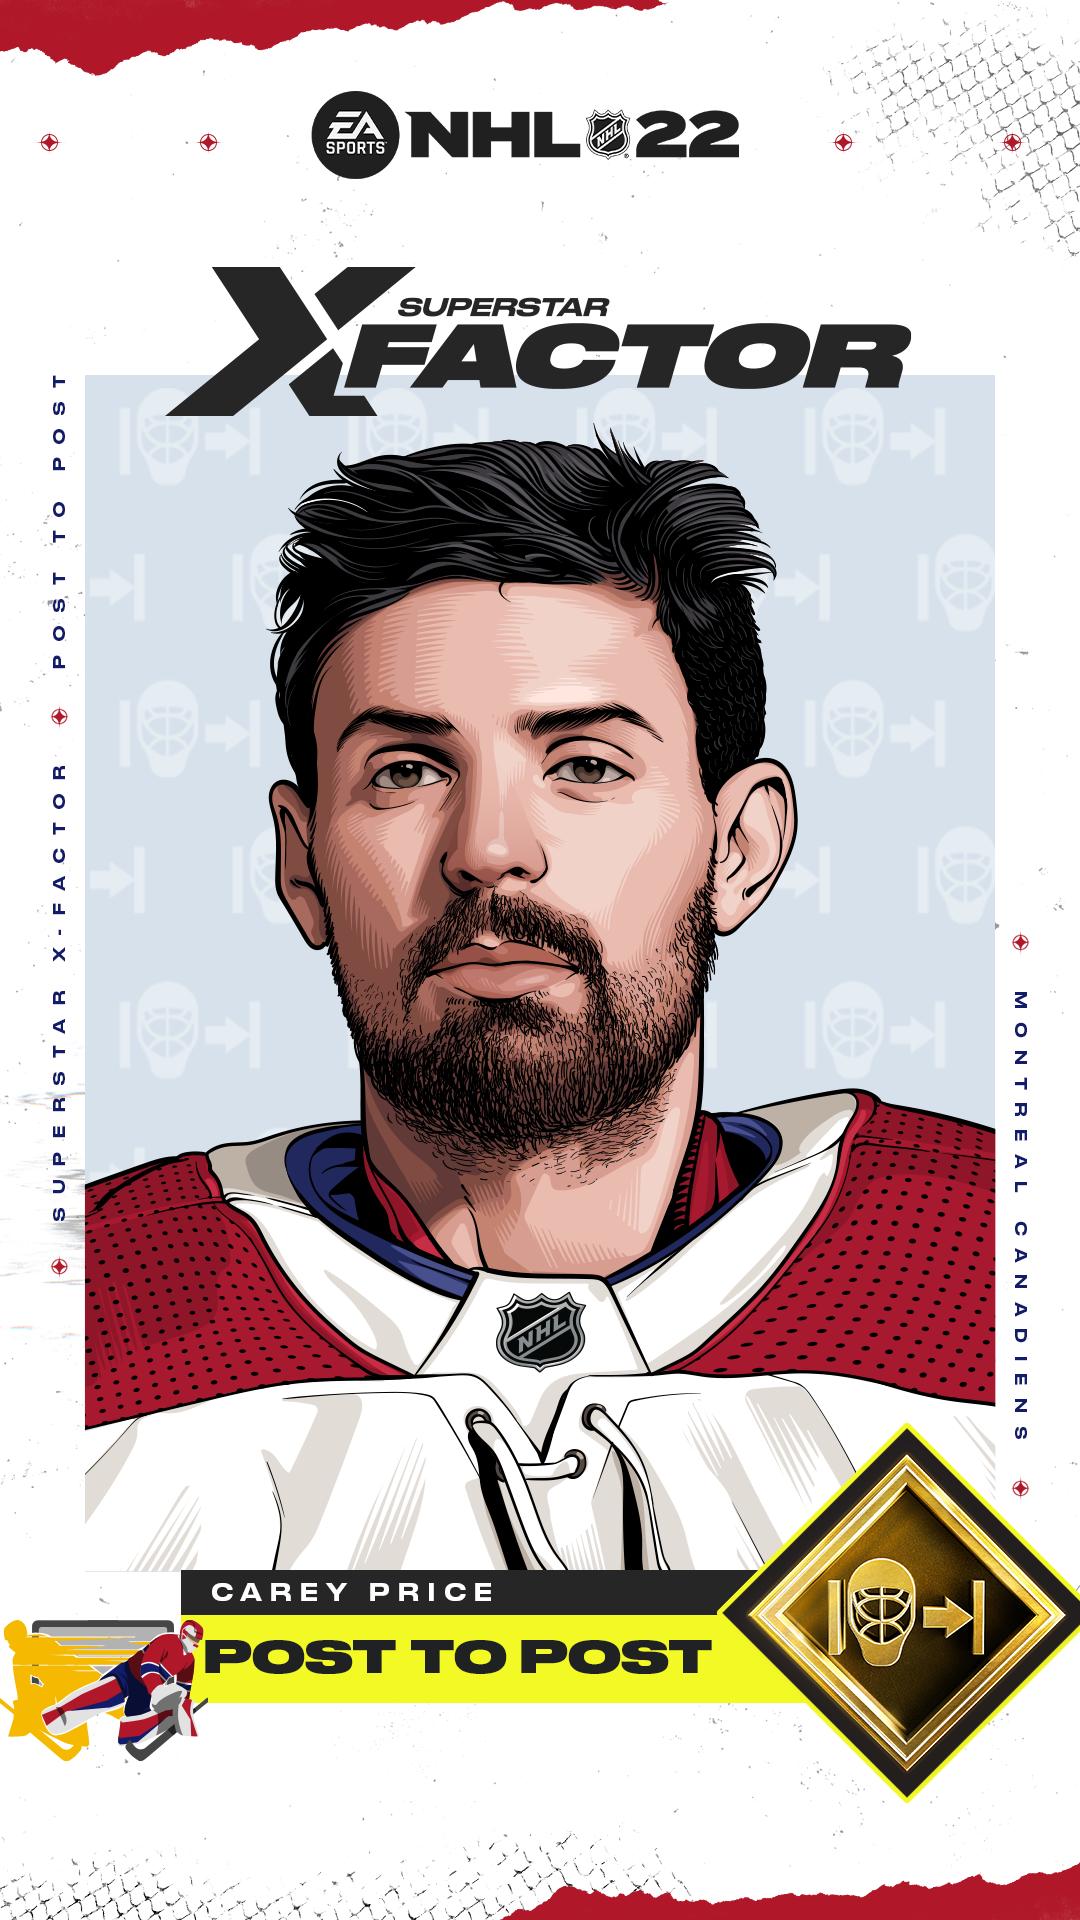 NHL22_XFactor_CareyPrice__9x16